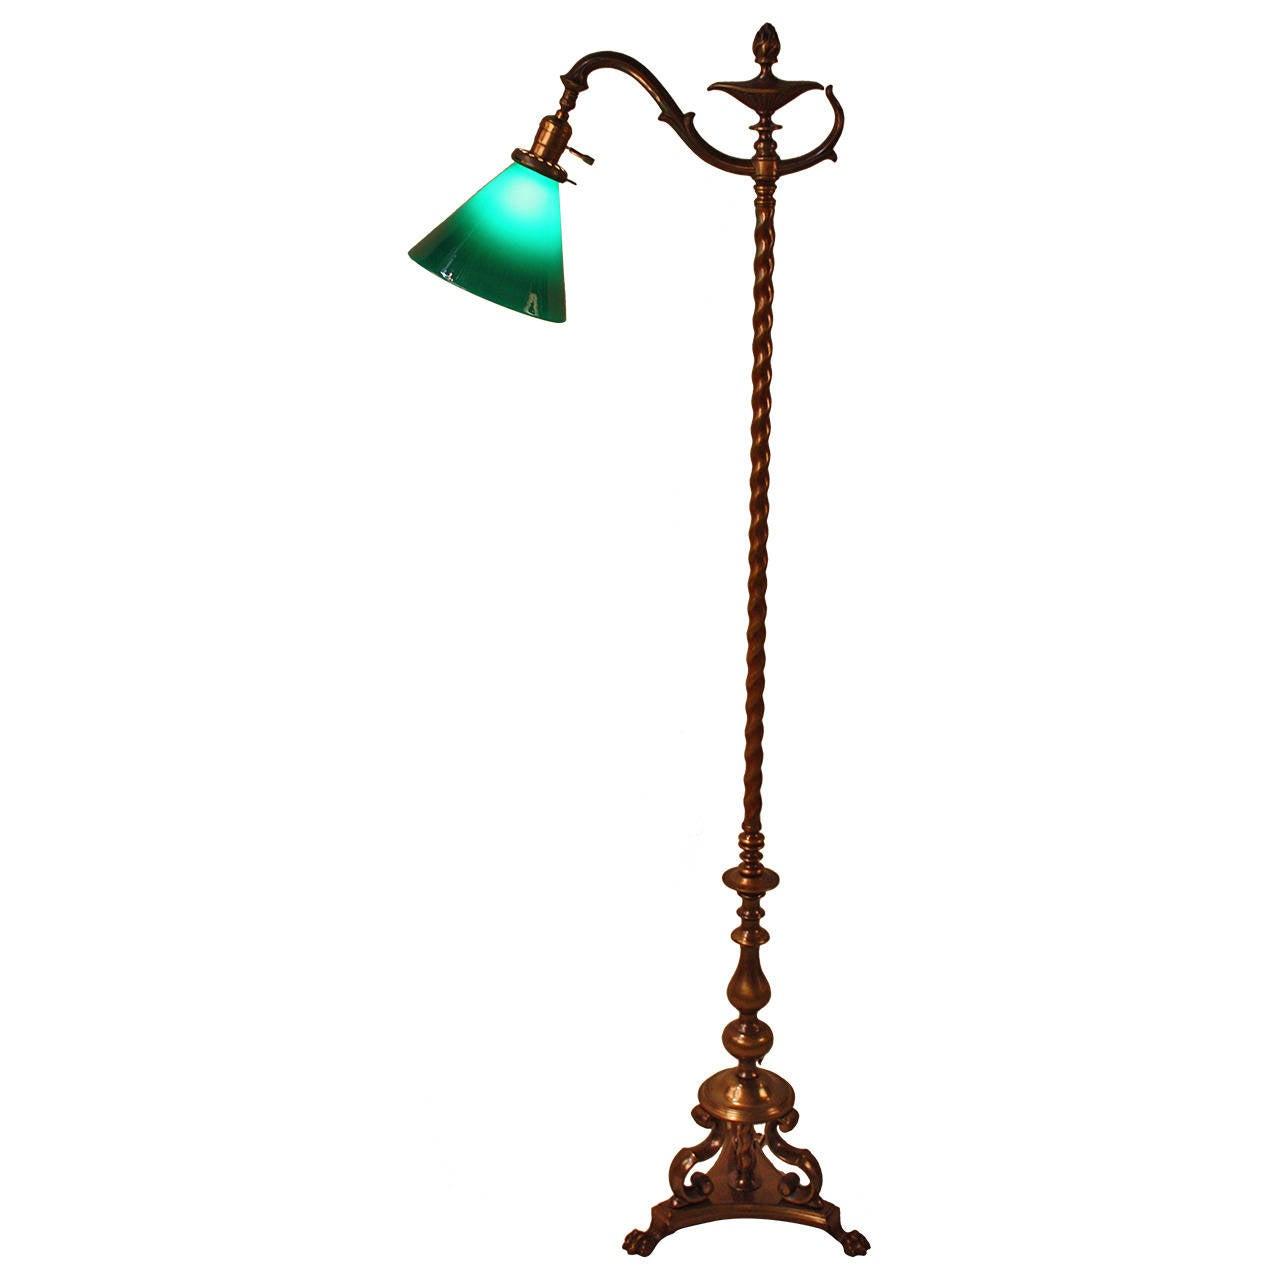 American 1920s floor lamp at 1stdibs for 1920s floor lamps